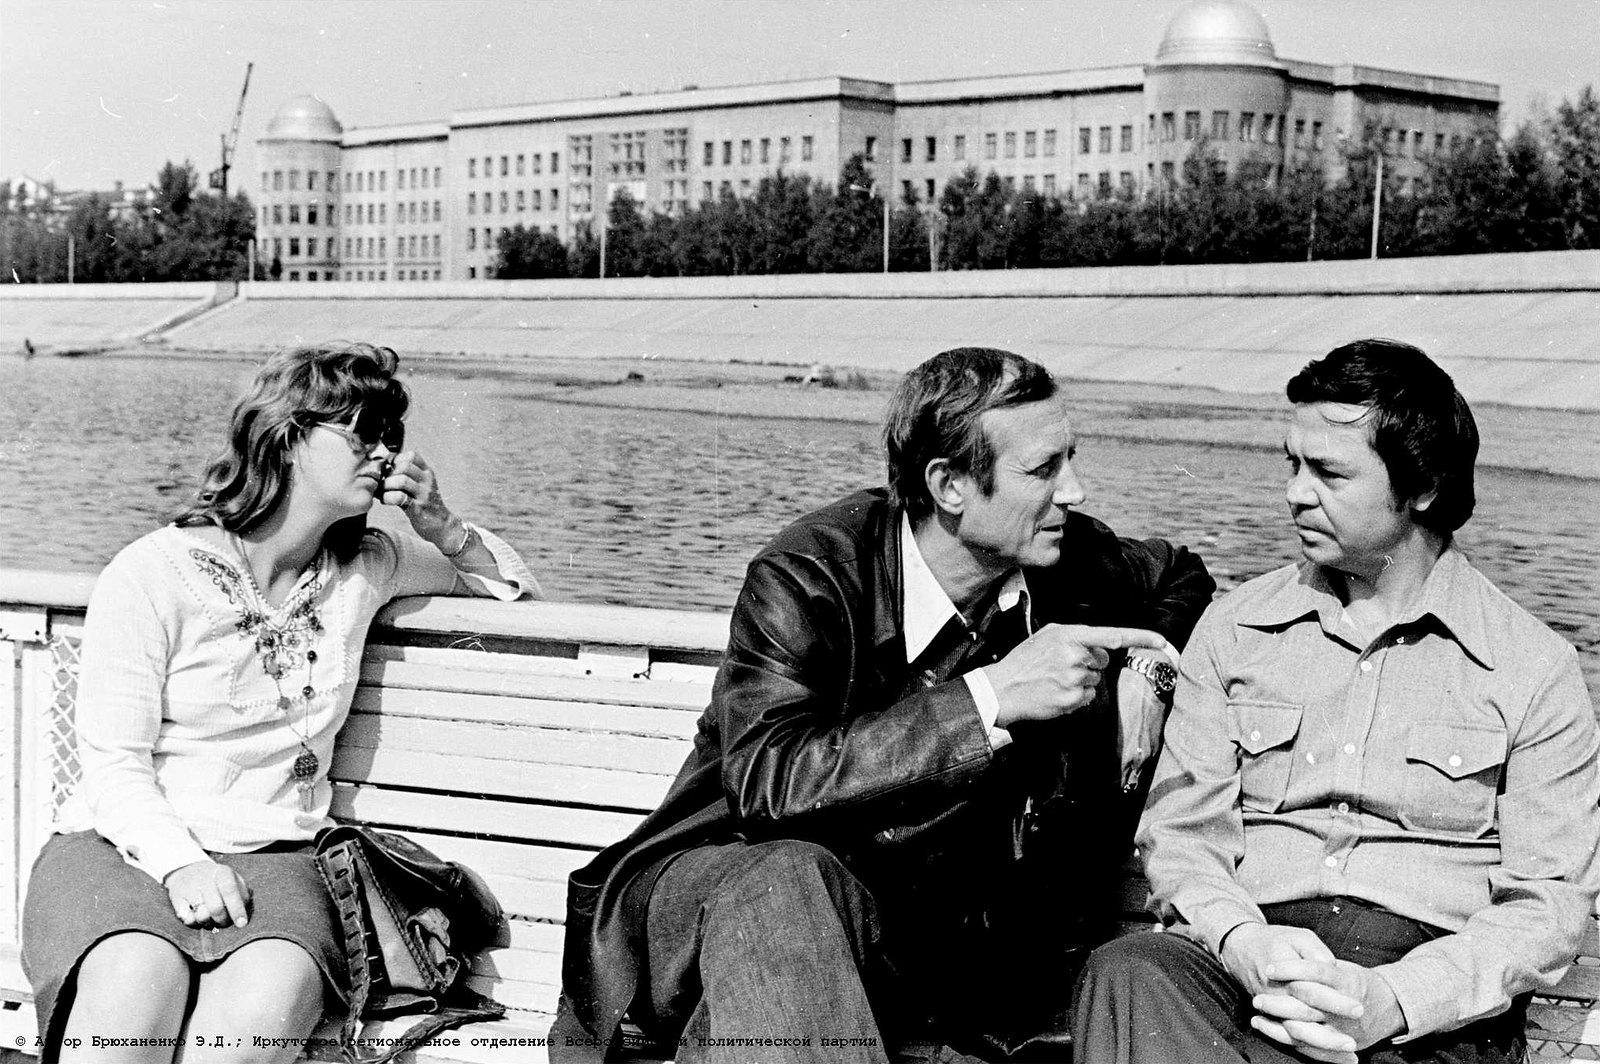 1977. Иркутск. Евгений Евтушенко и Валентин Распутин на Ангаре